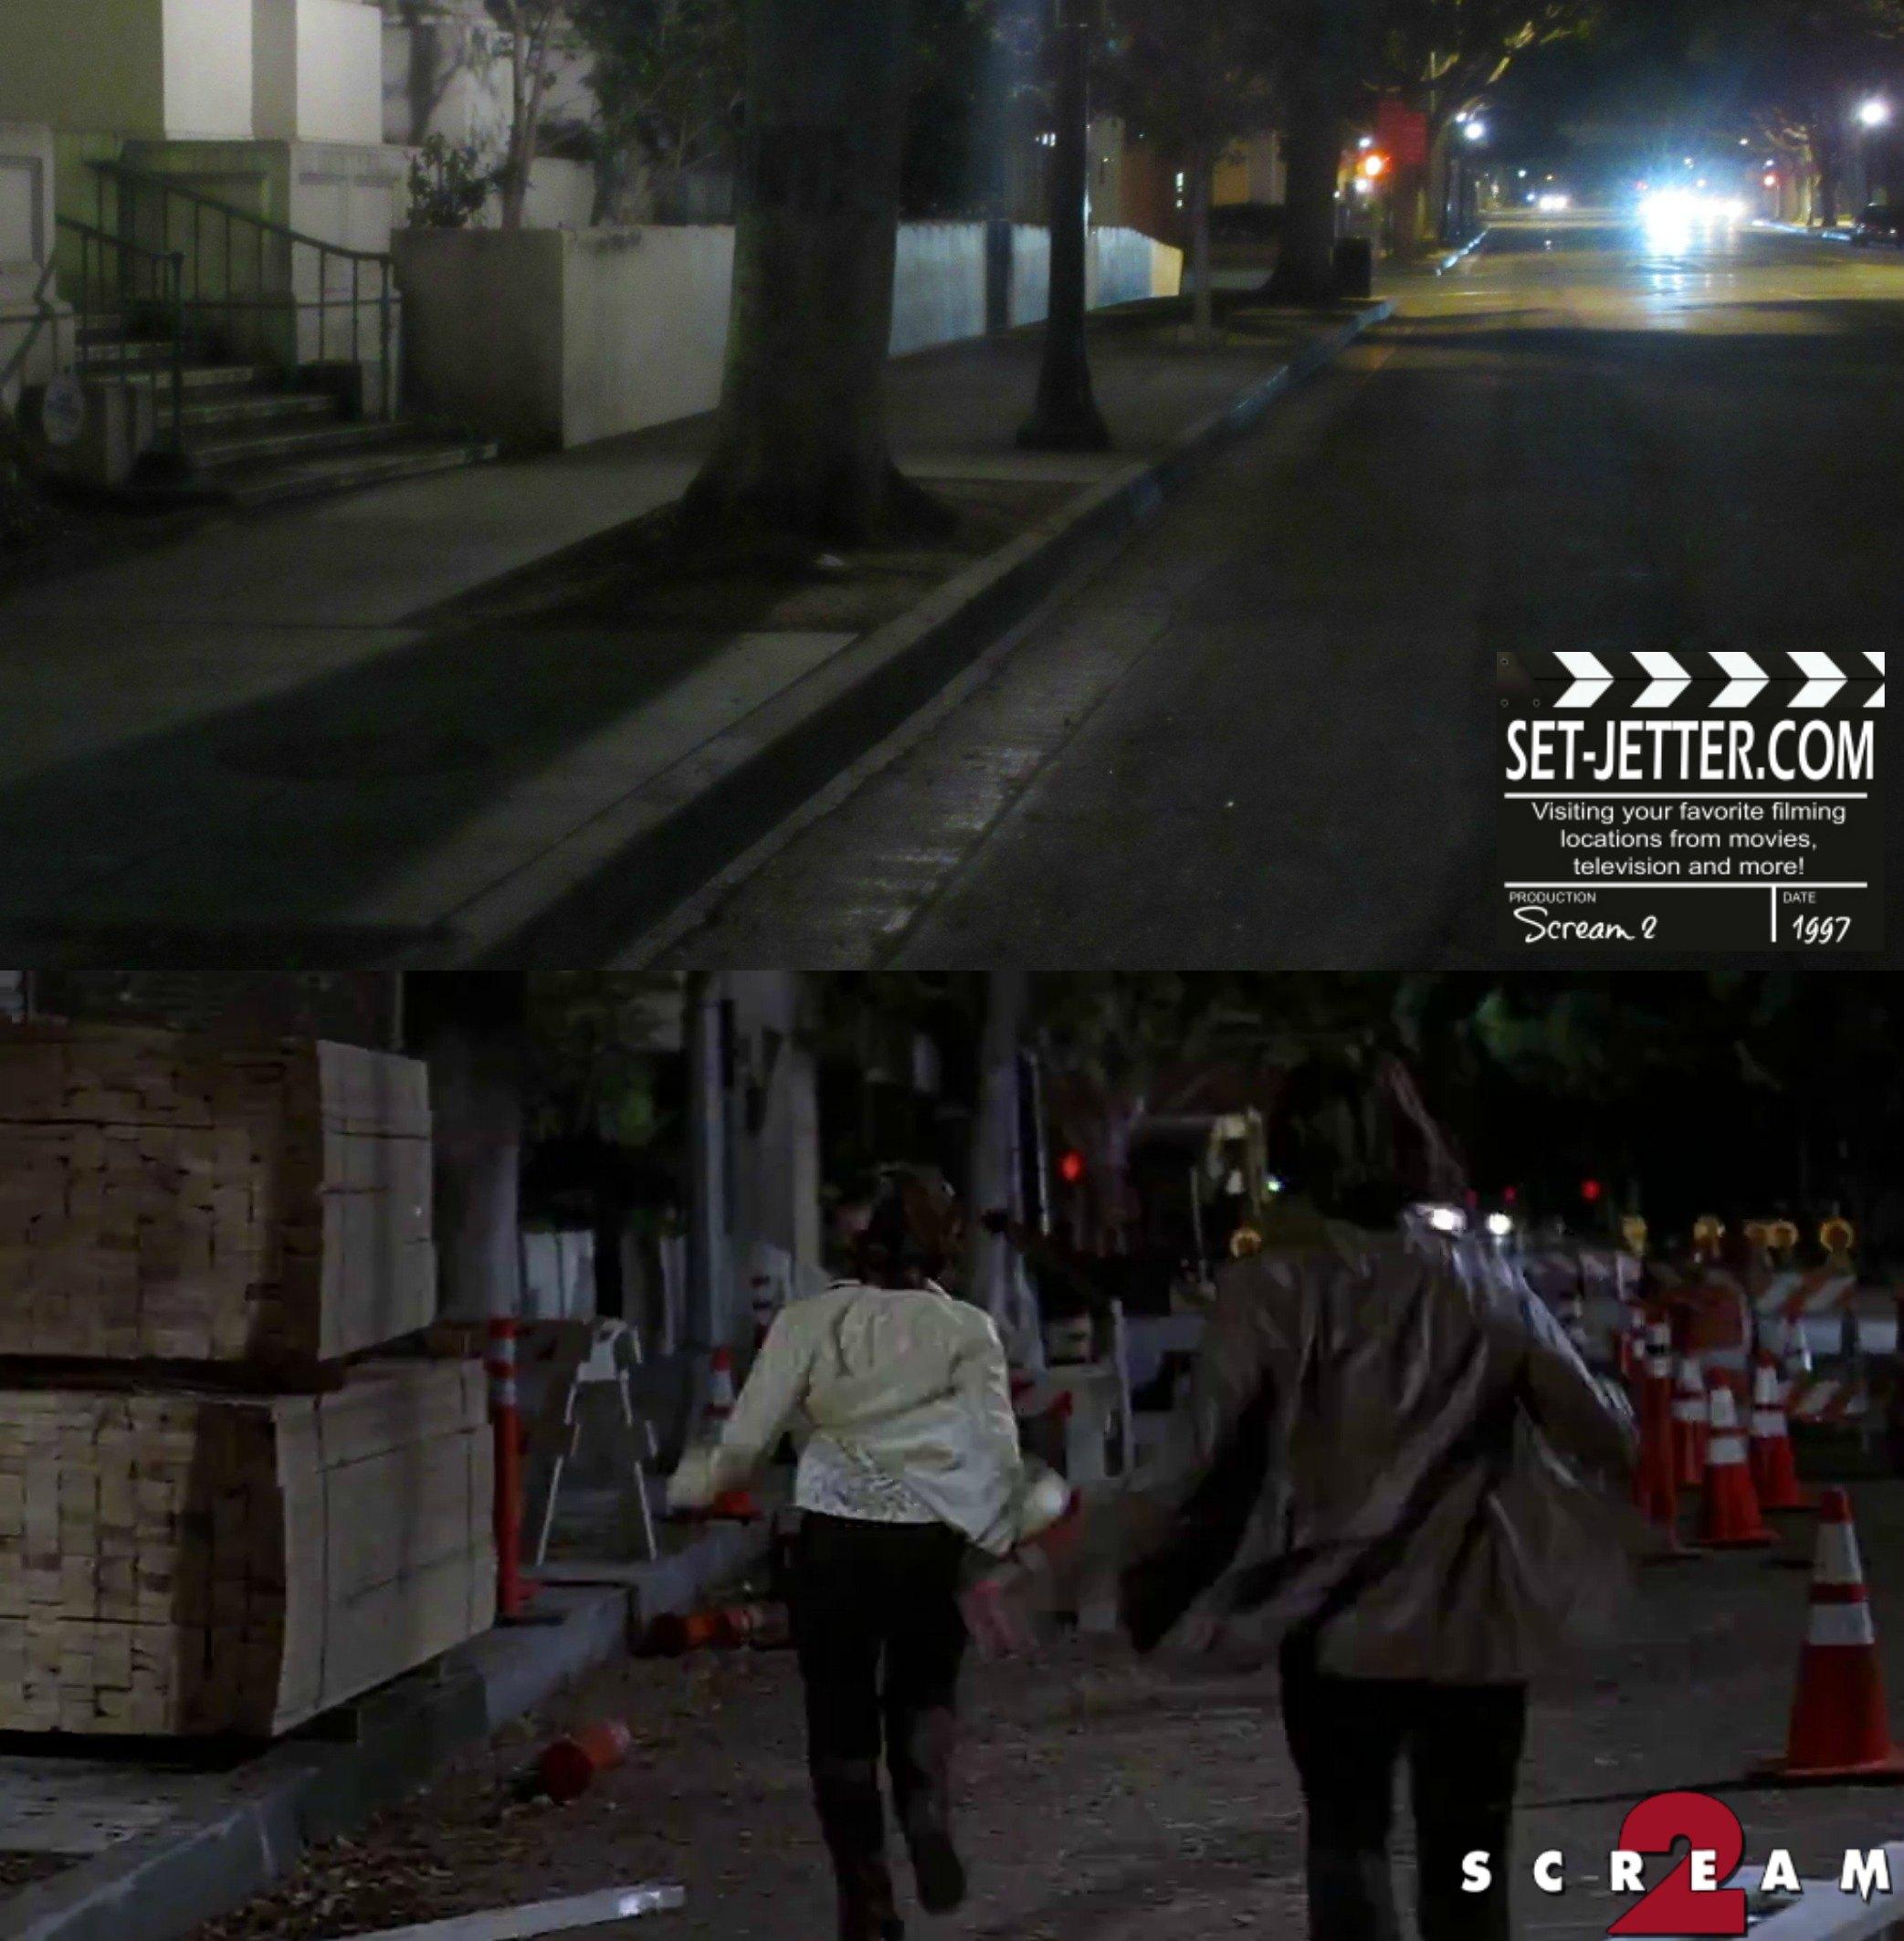 Scream 2 comparison 227.jpg